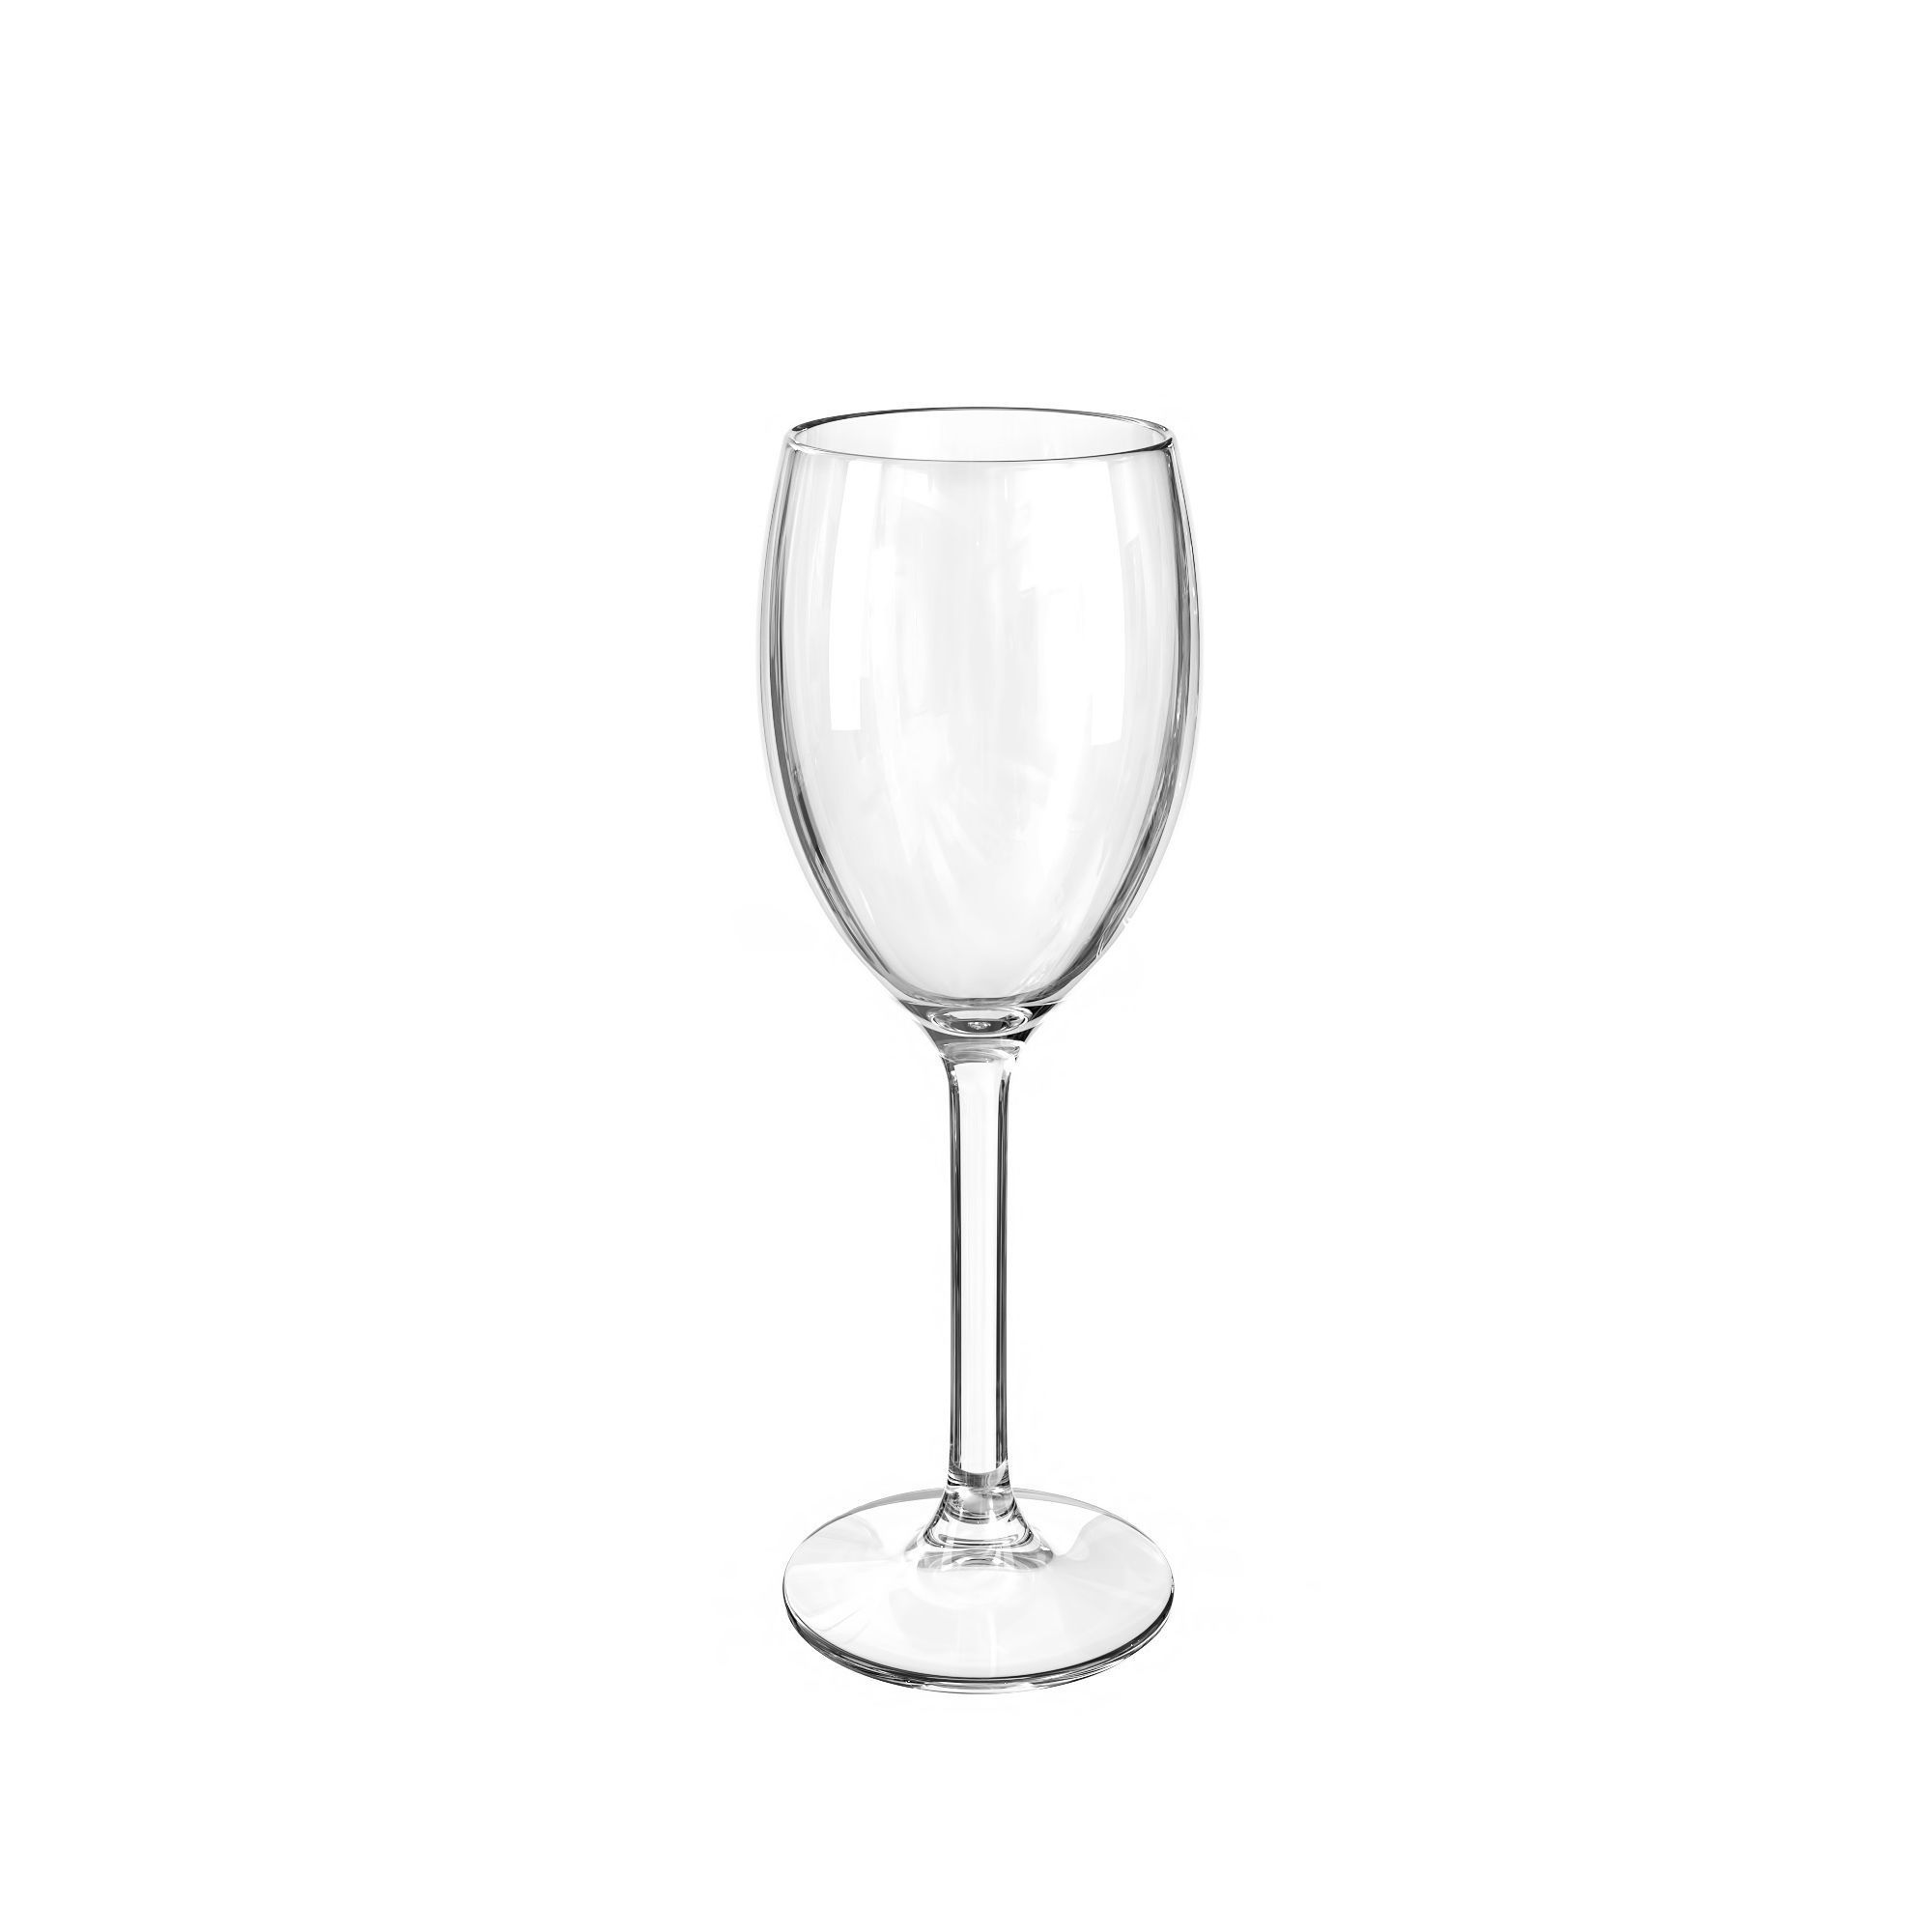 2000x2000 Empty Wine Glass 3d Cgtrader